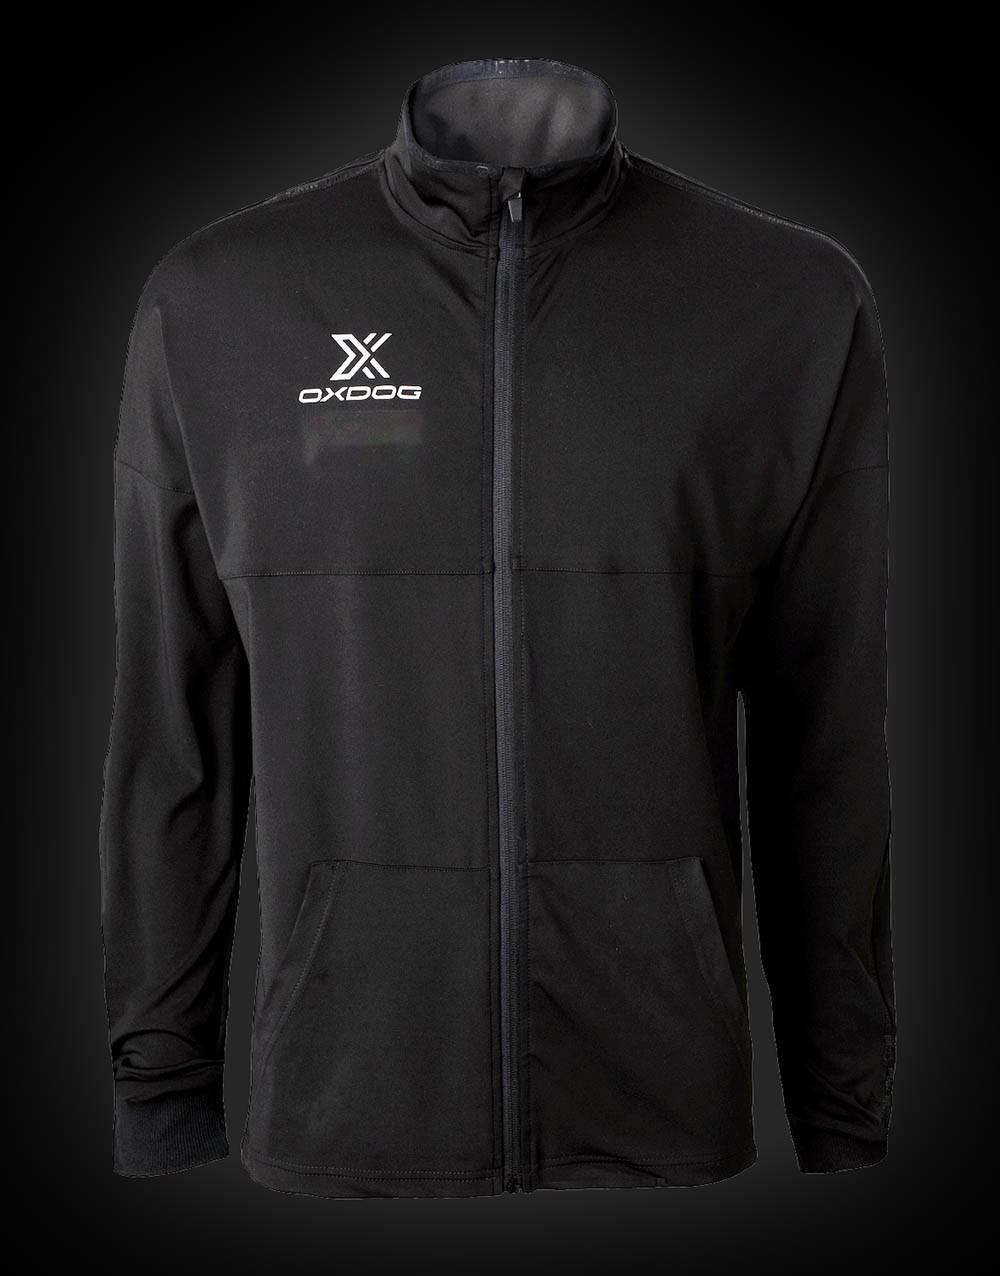 OXDOG Speed Jacket black